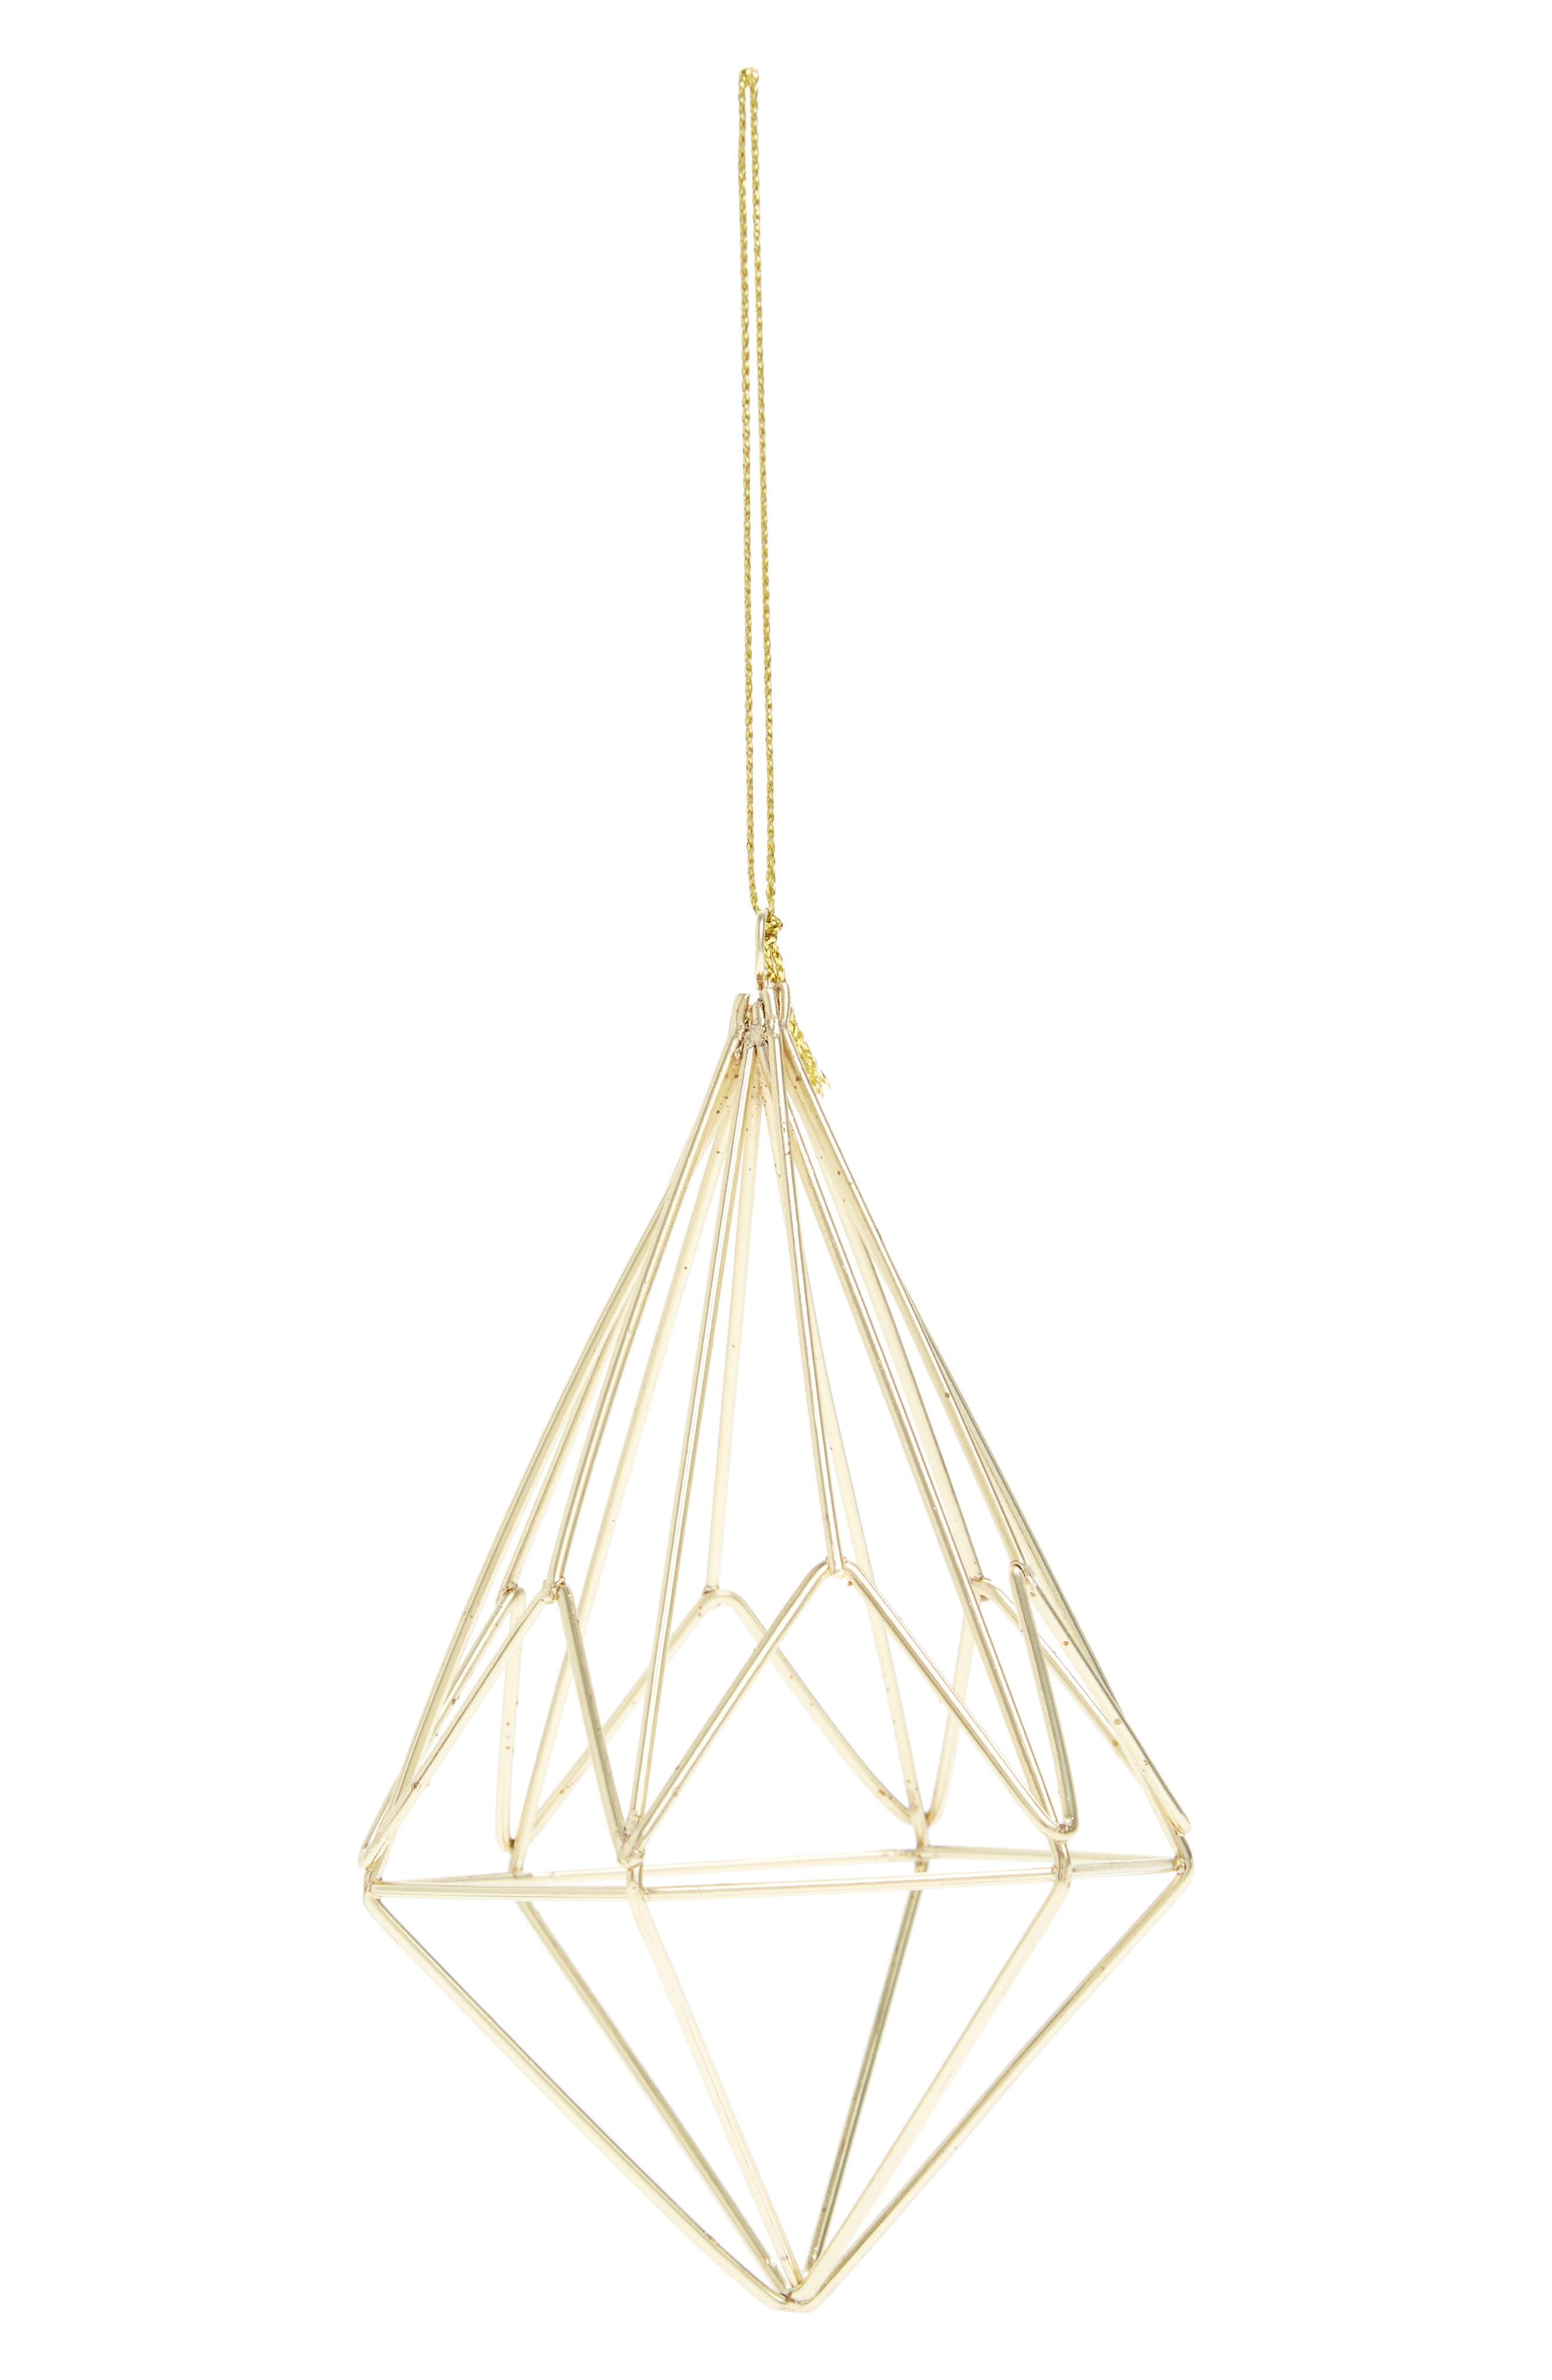 Nordstrom at Home Geometric Gem Ornament